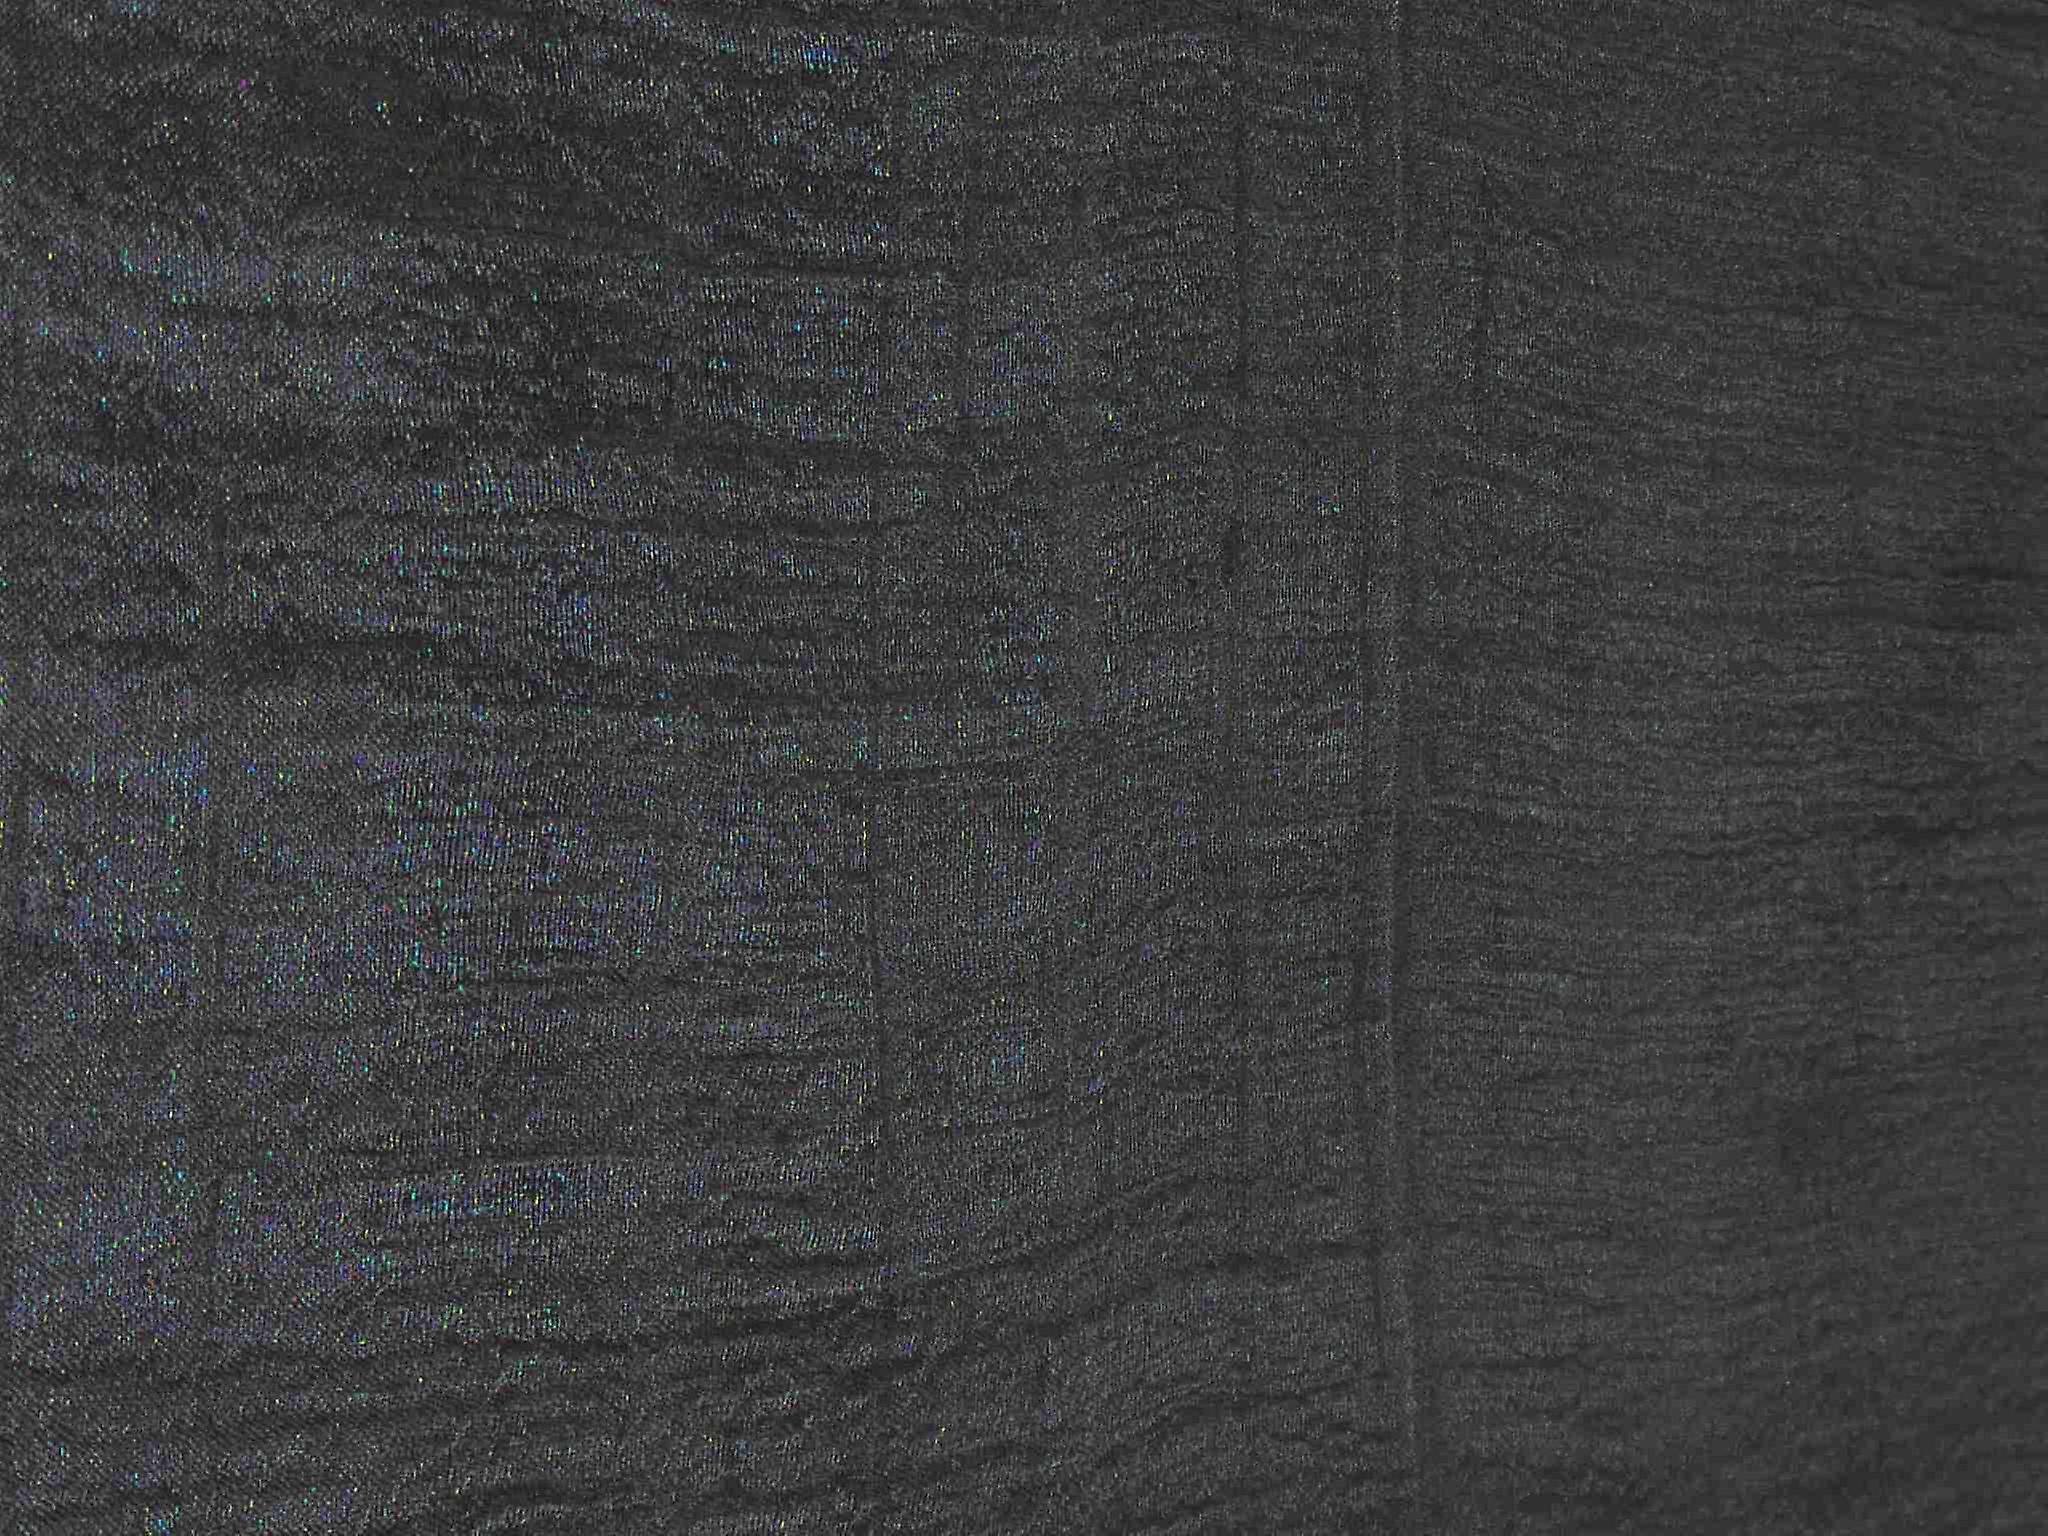 Pure Raw Silk Long Scarf Saigon Lua Van Weave Black by Pashmina & Silk